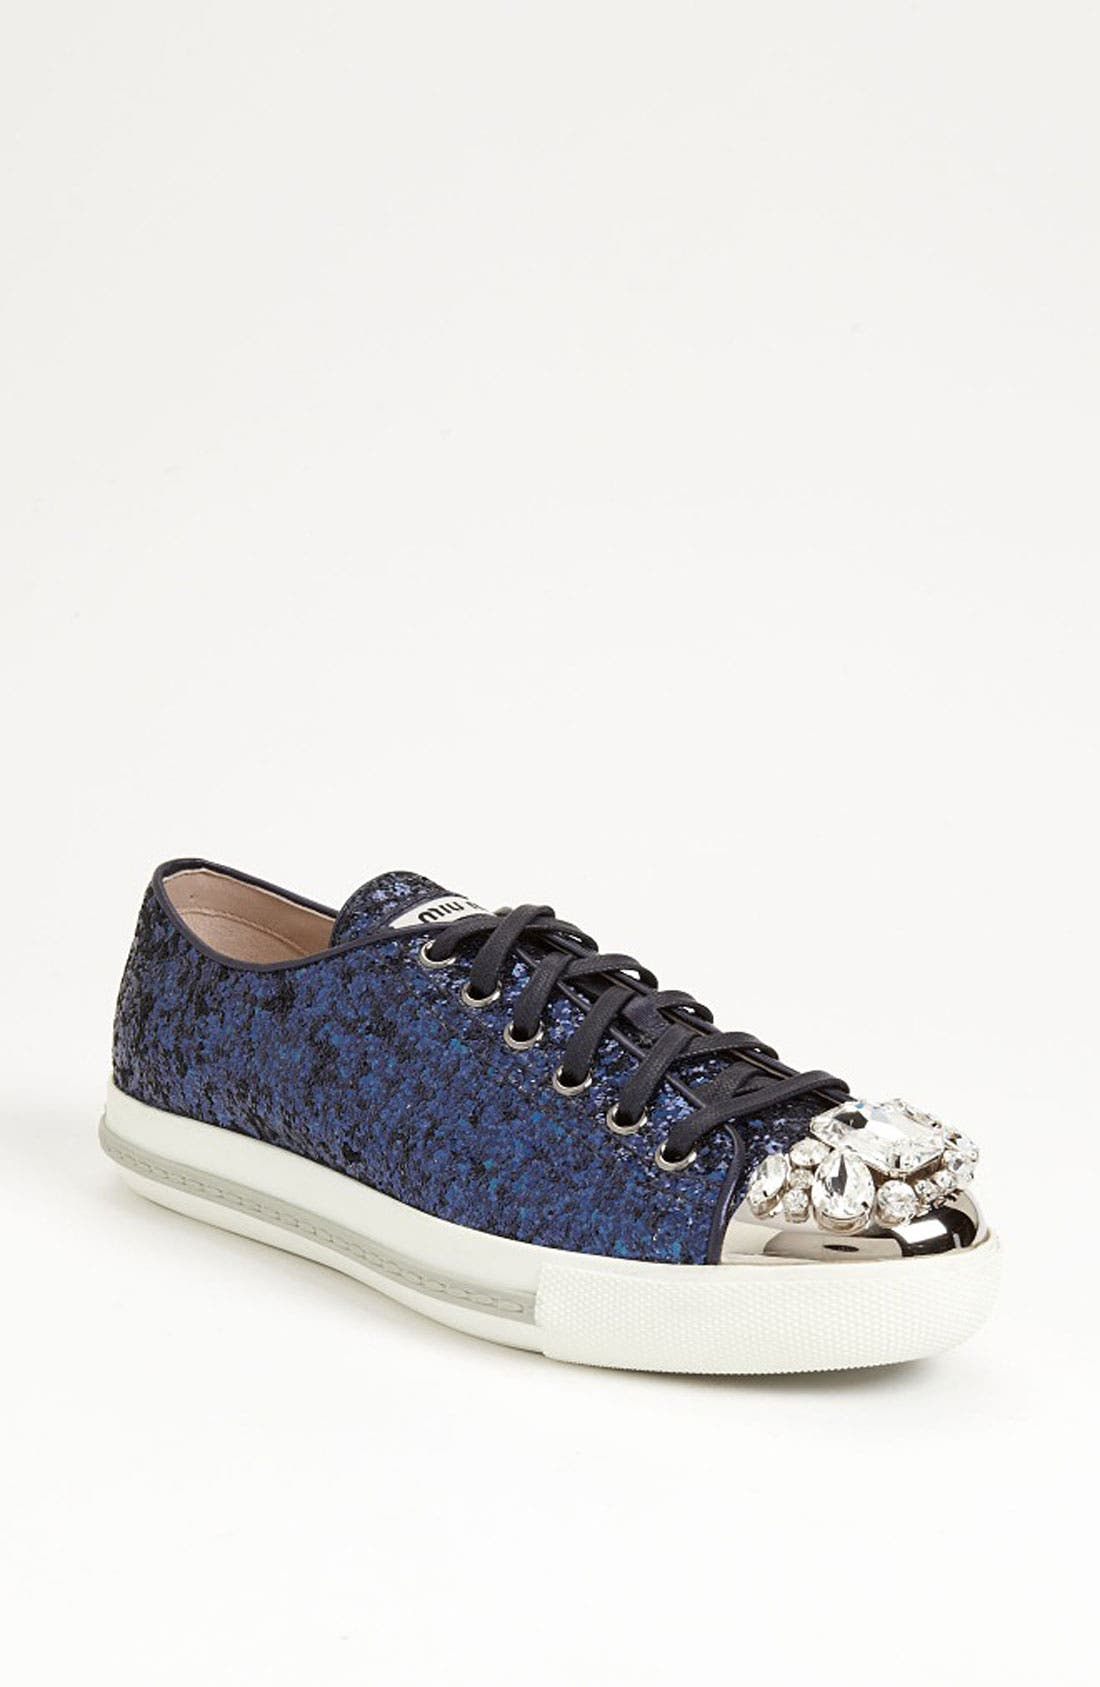 Alternate Image 1 Selected - Miu Miu Glitter Crystal Toe Sneaker